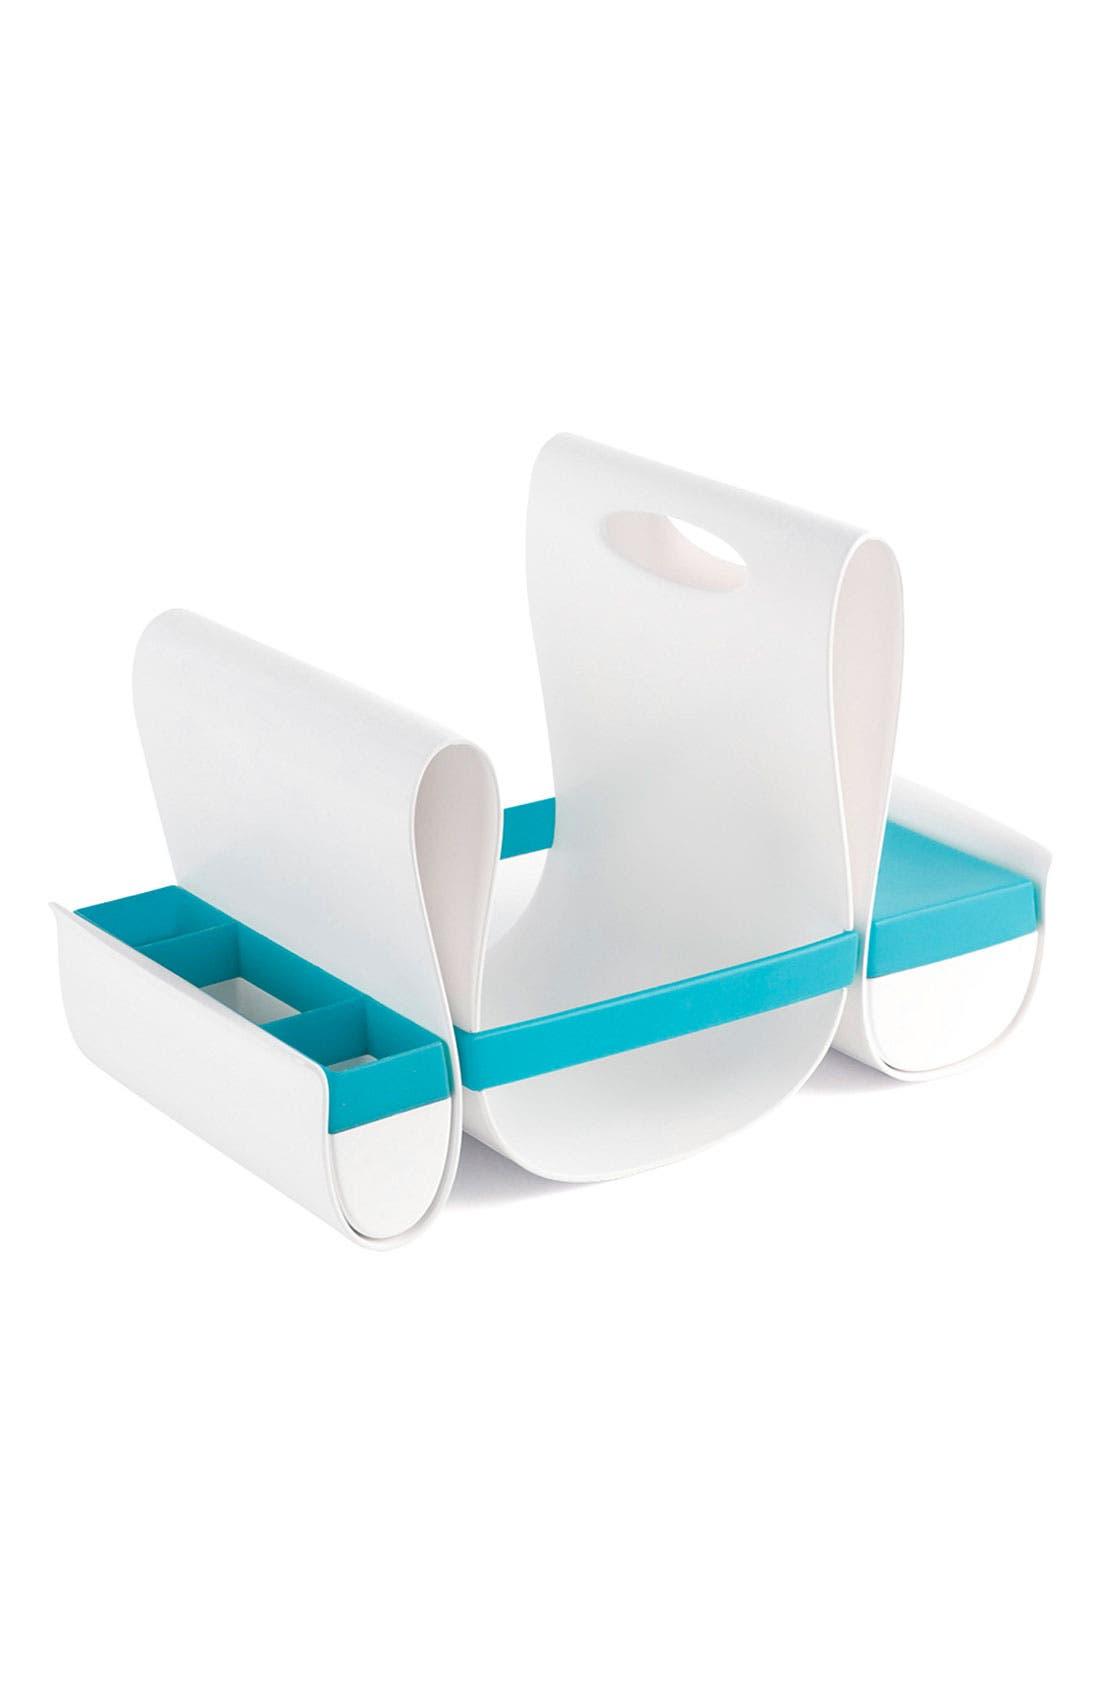 Alternate Image 1 Selected - Boon 'Loop' Diaper Caddy